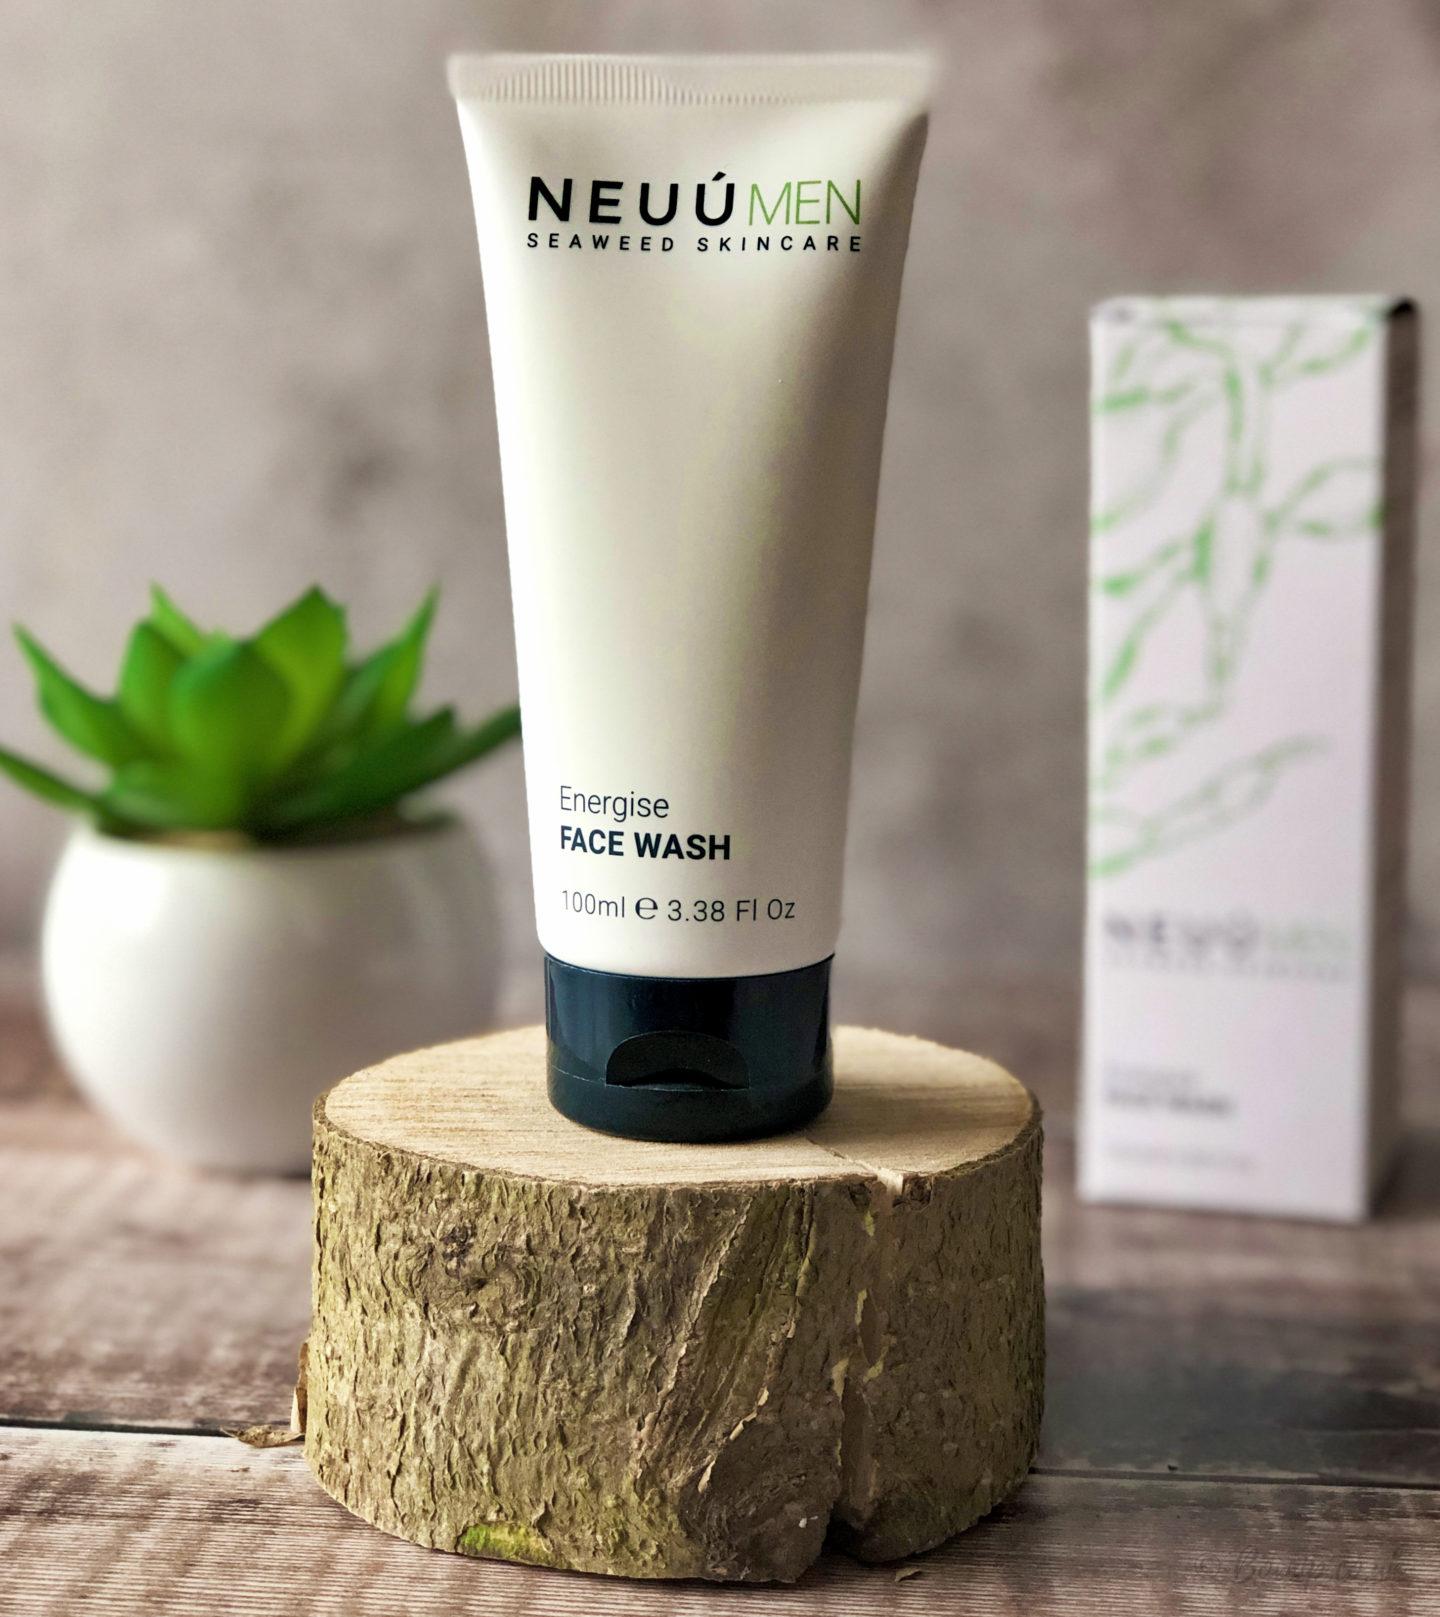 NEUÚ SEAWEED SKINCARE FOR MEN - Energise Face Wash